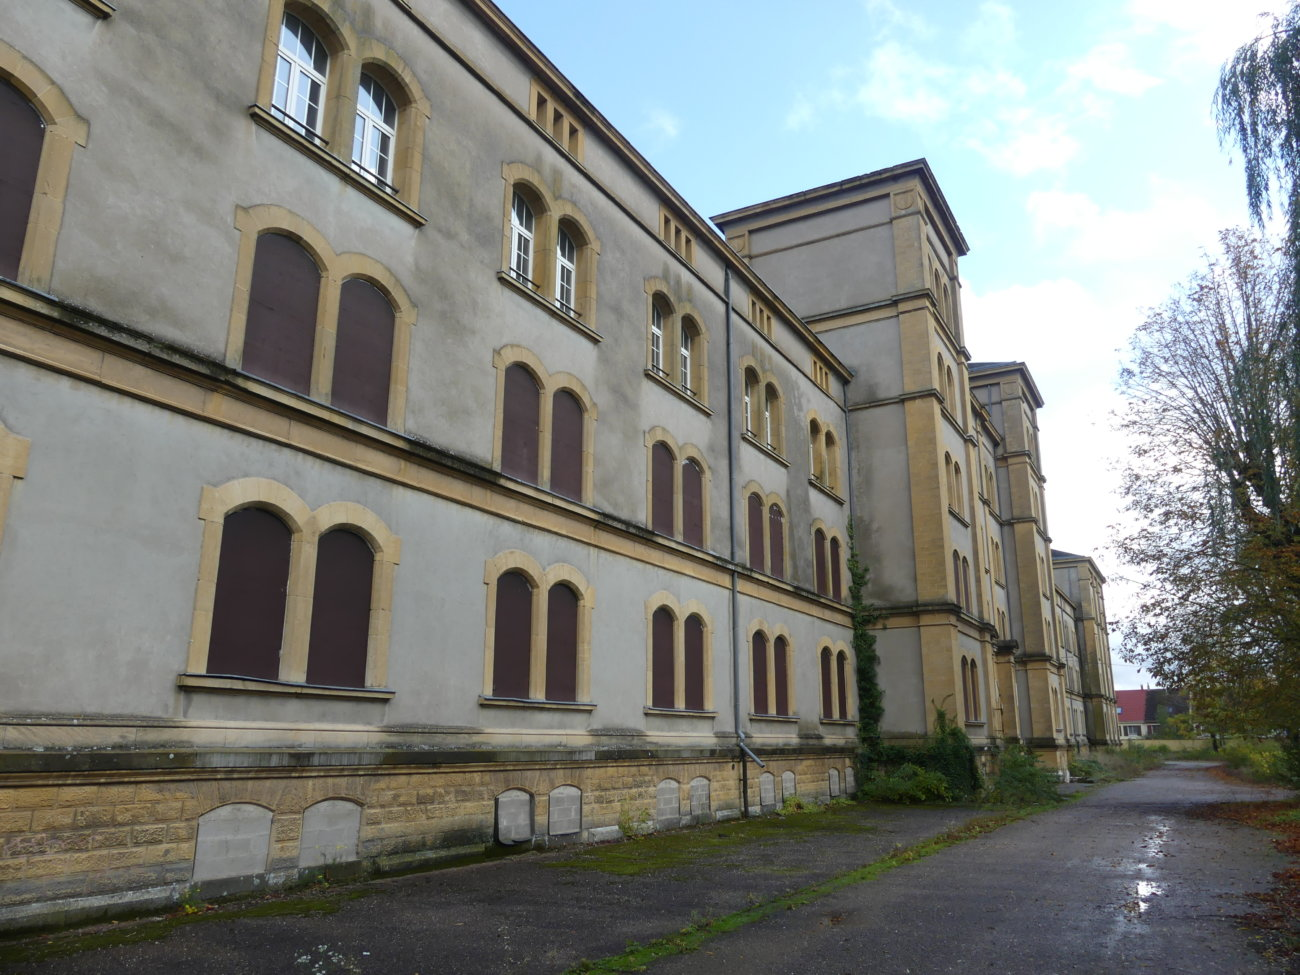 Caserne Désvallières – Metz